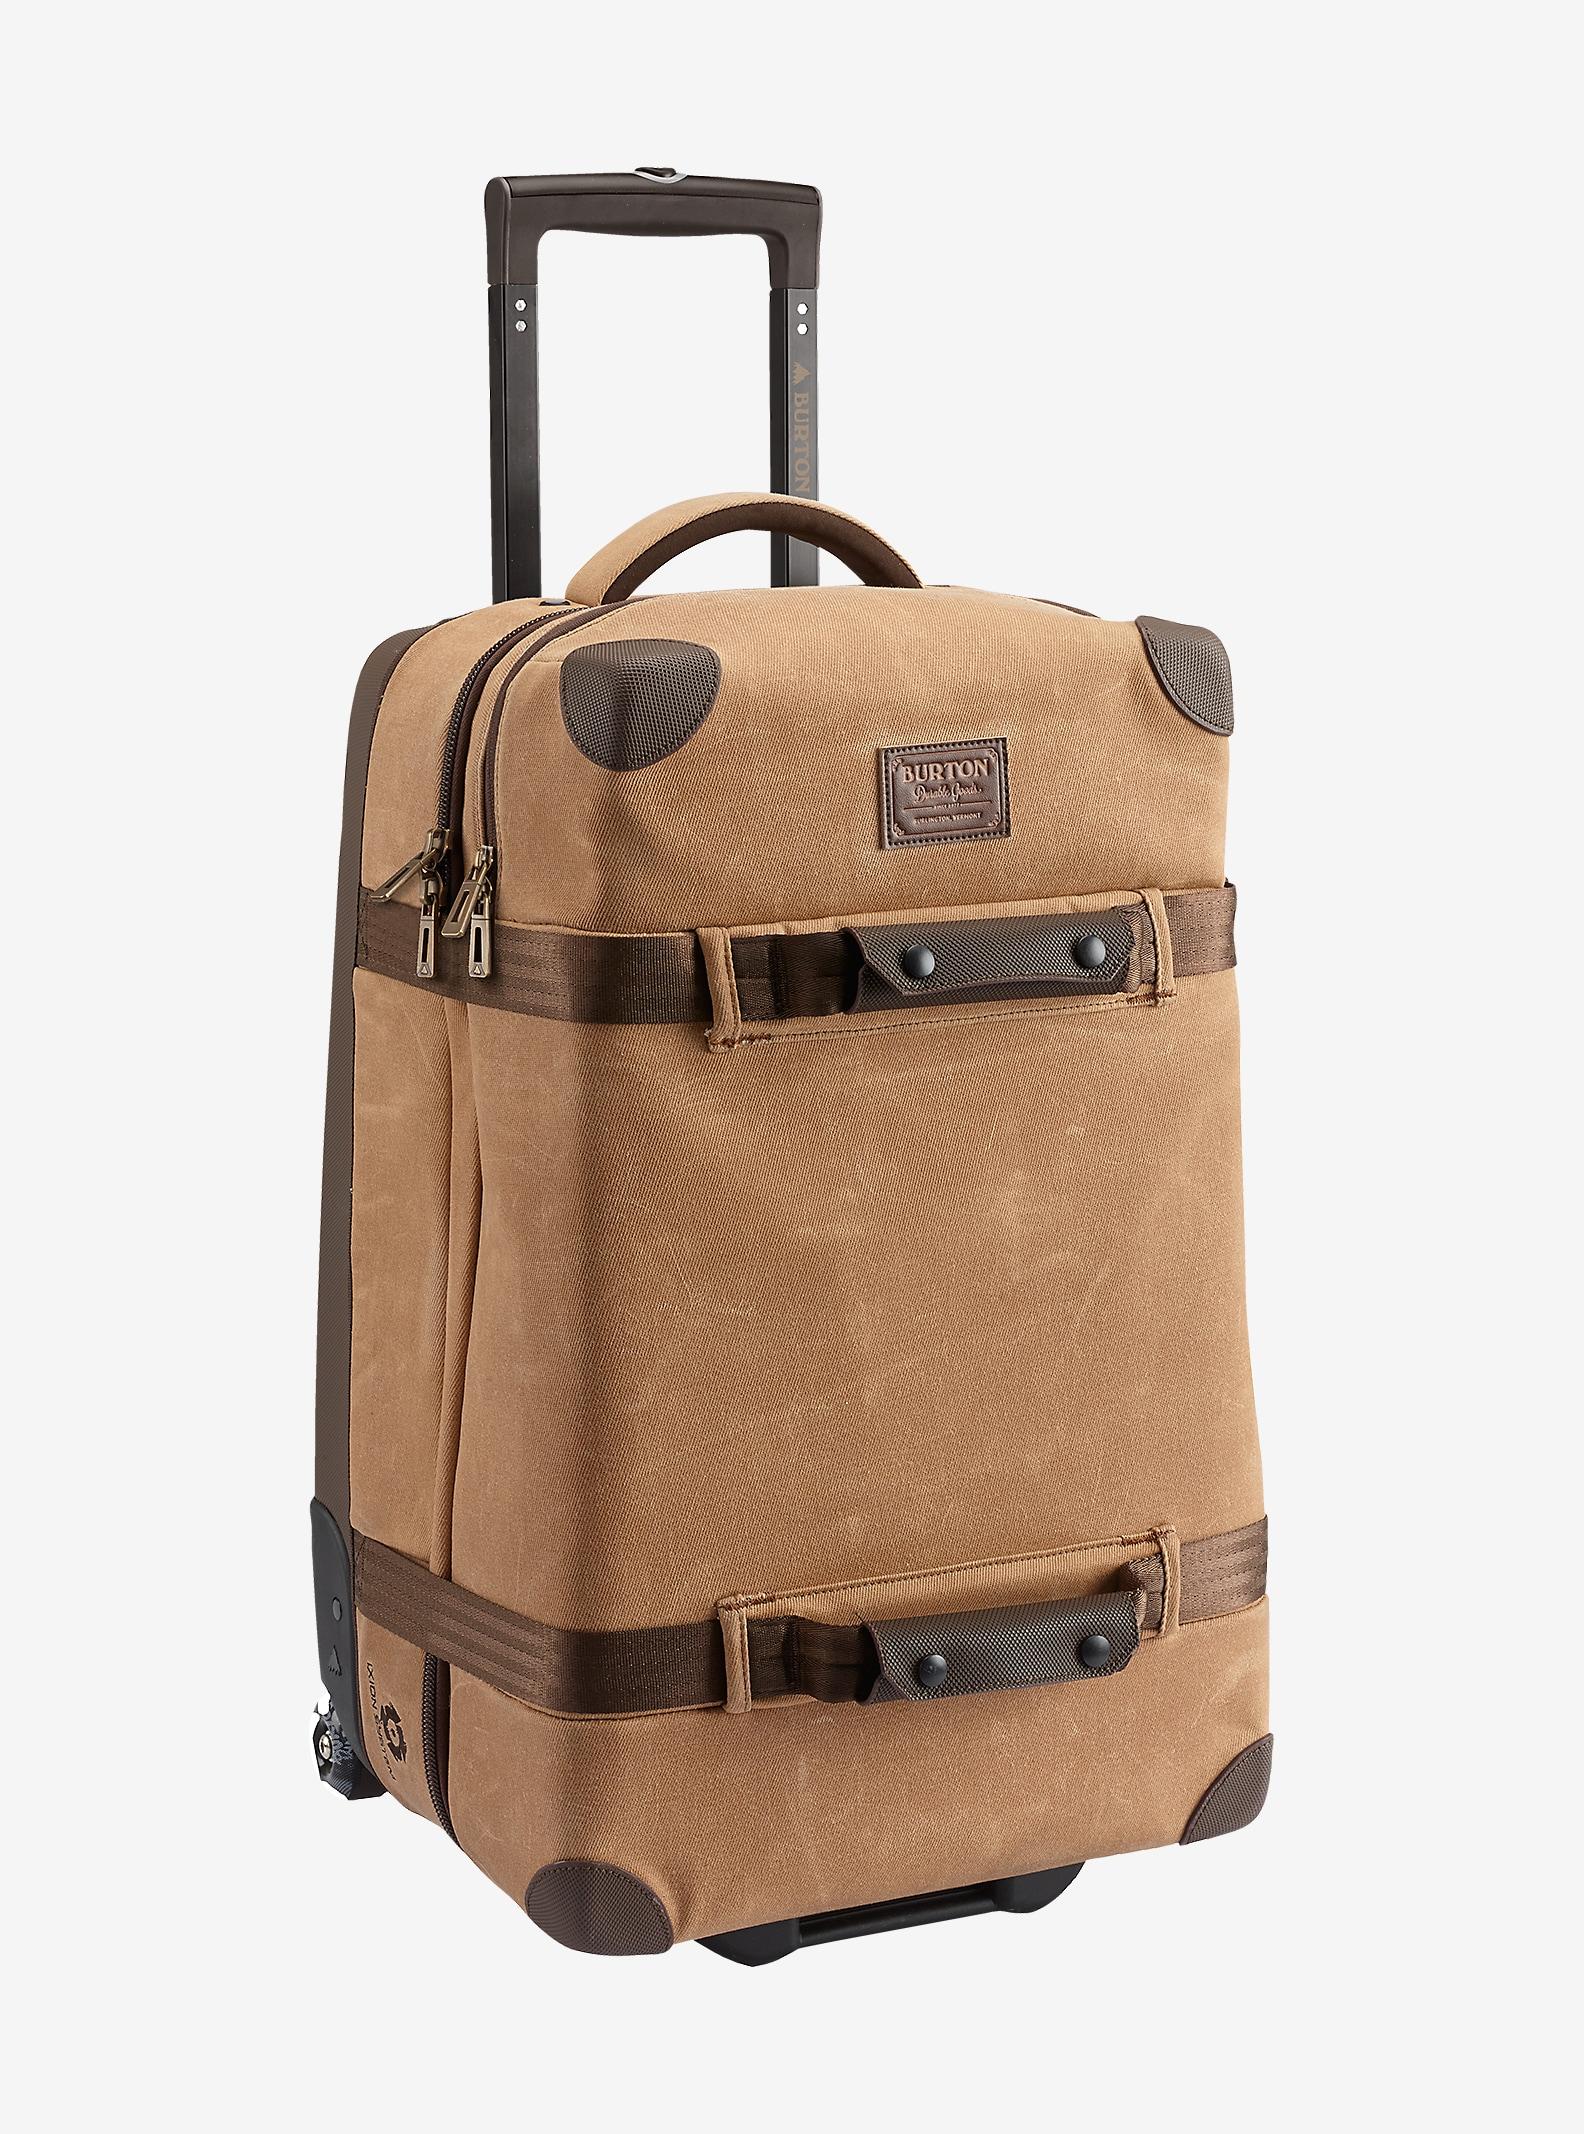 Burton Wheelie Cargo Travel Bag shown in Beagle Brown Waxed Canvas